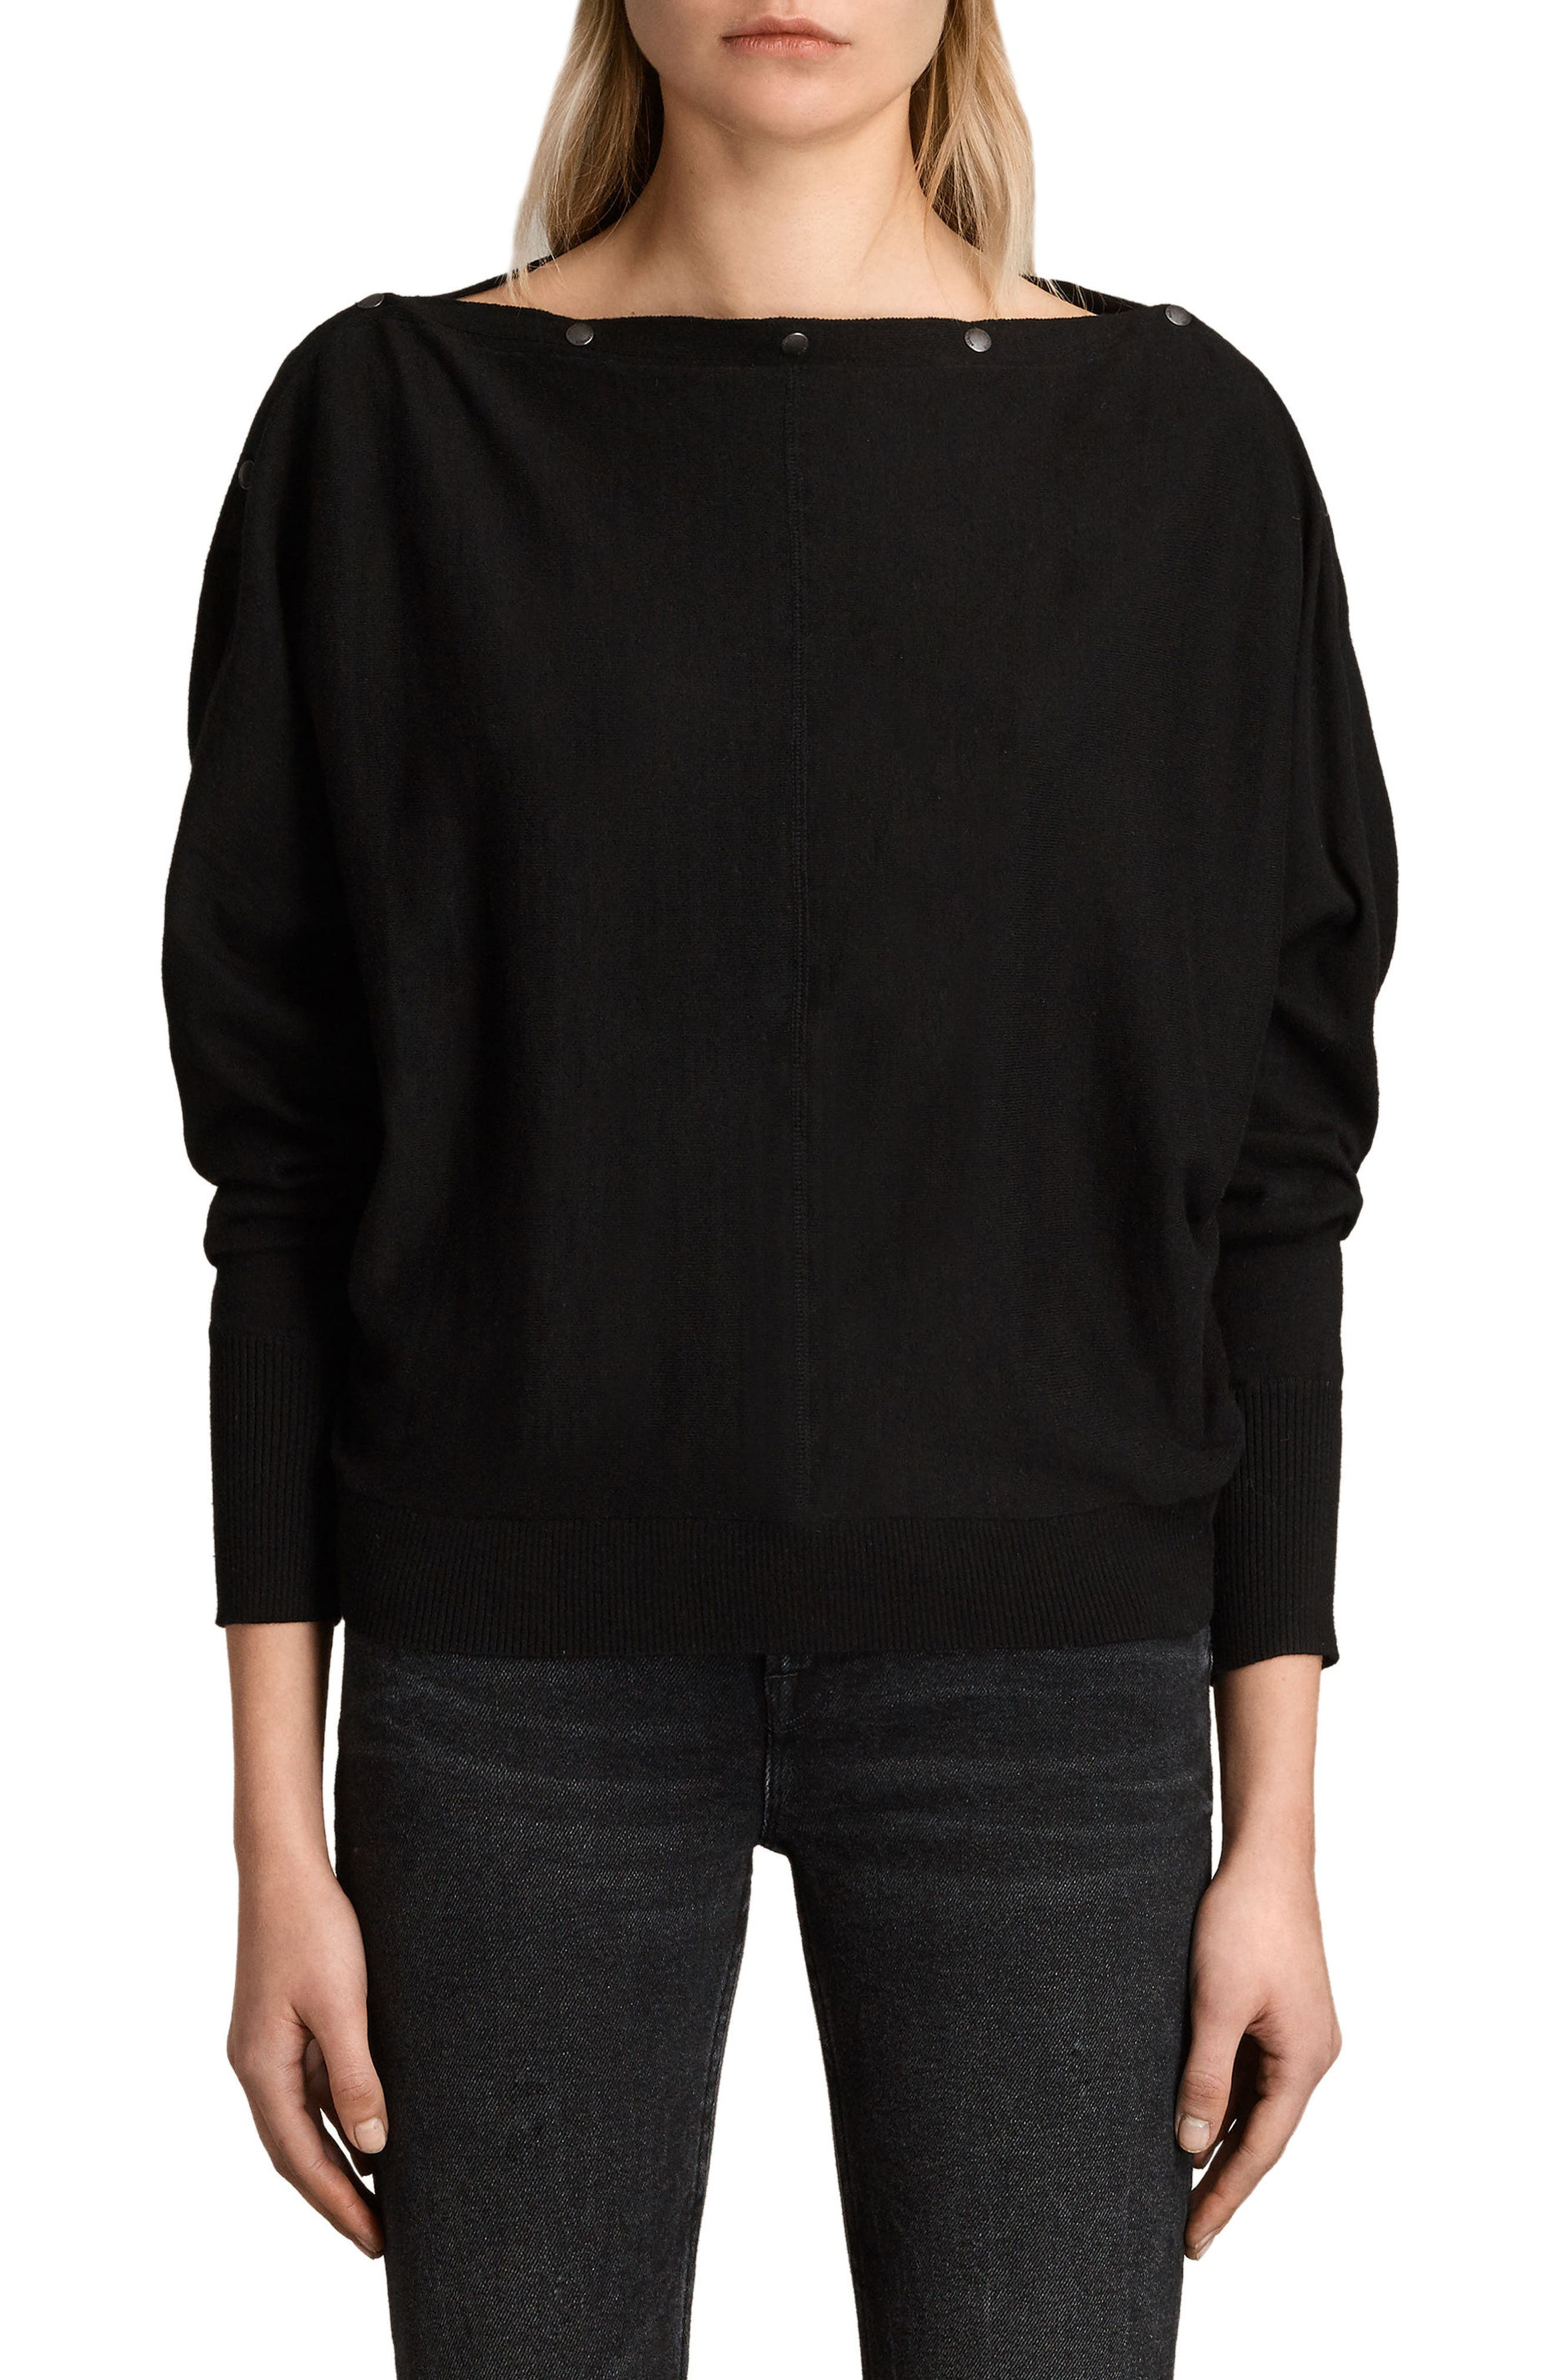 Elle Sweater,                             Main thumbnail 1, color,                             Black